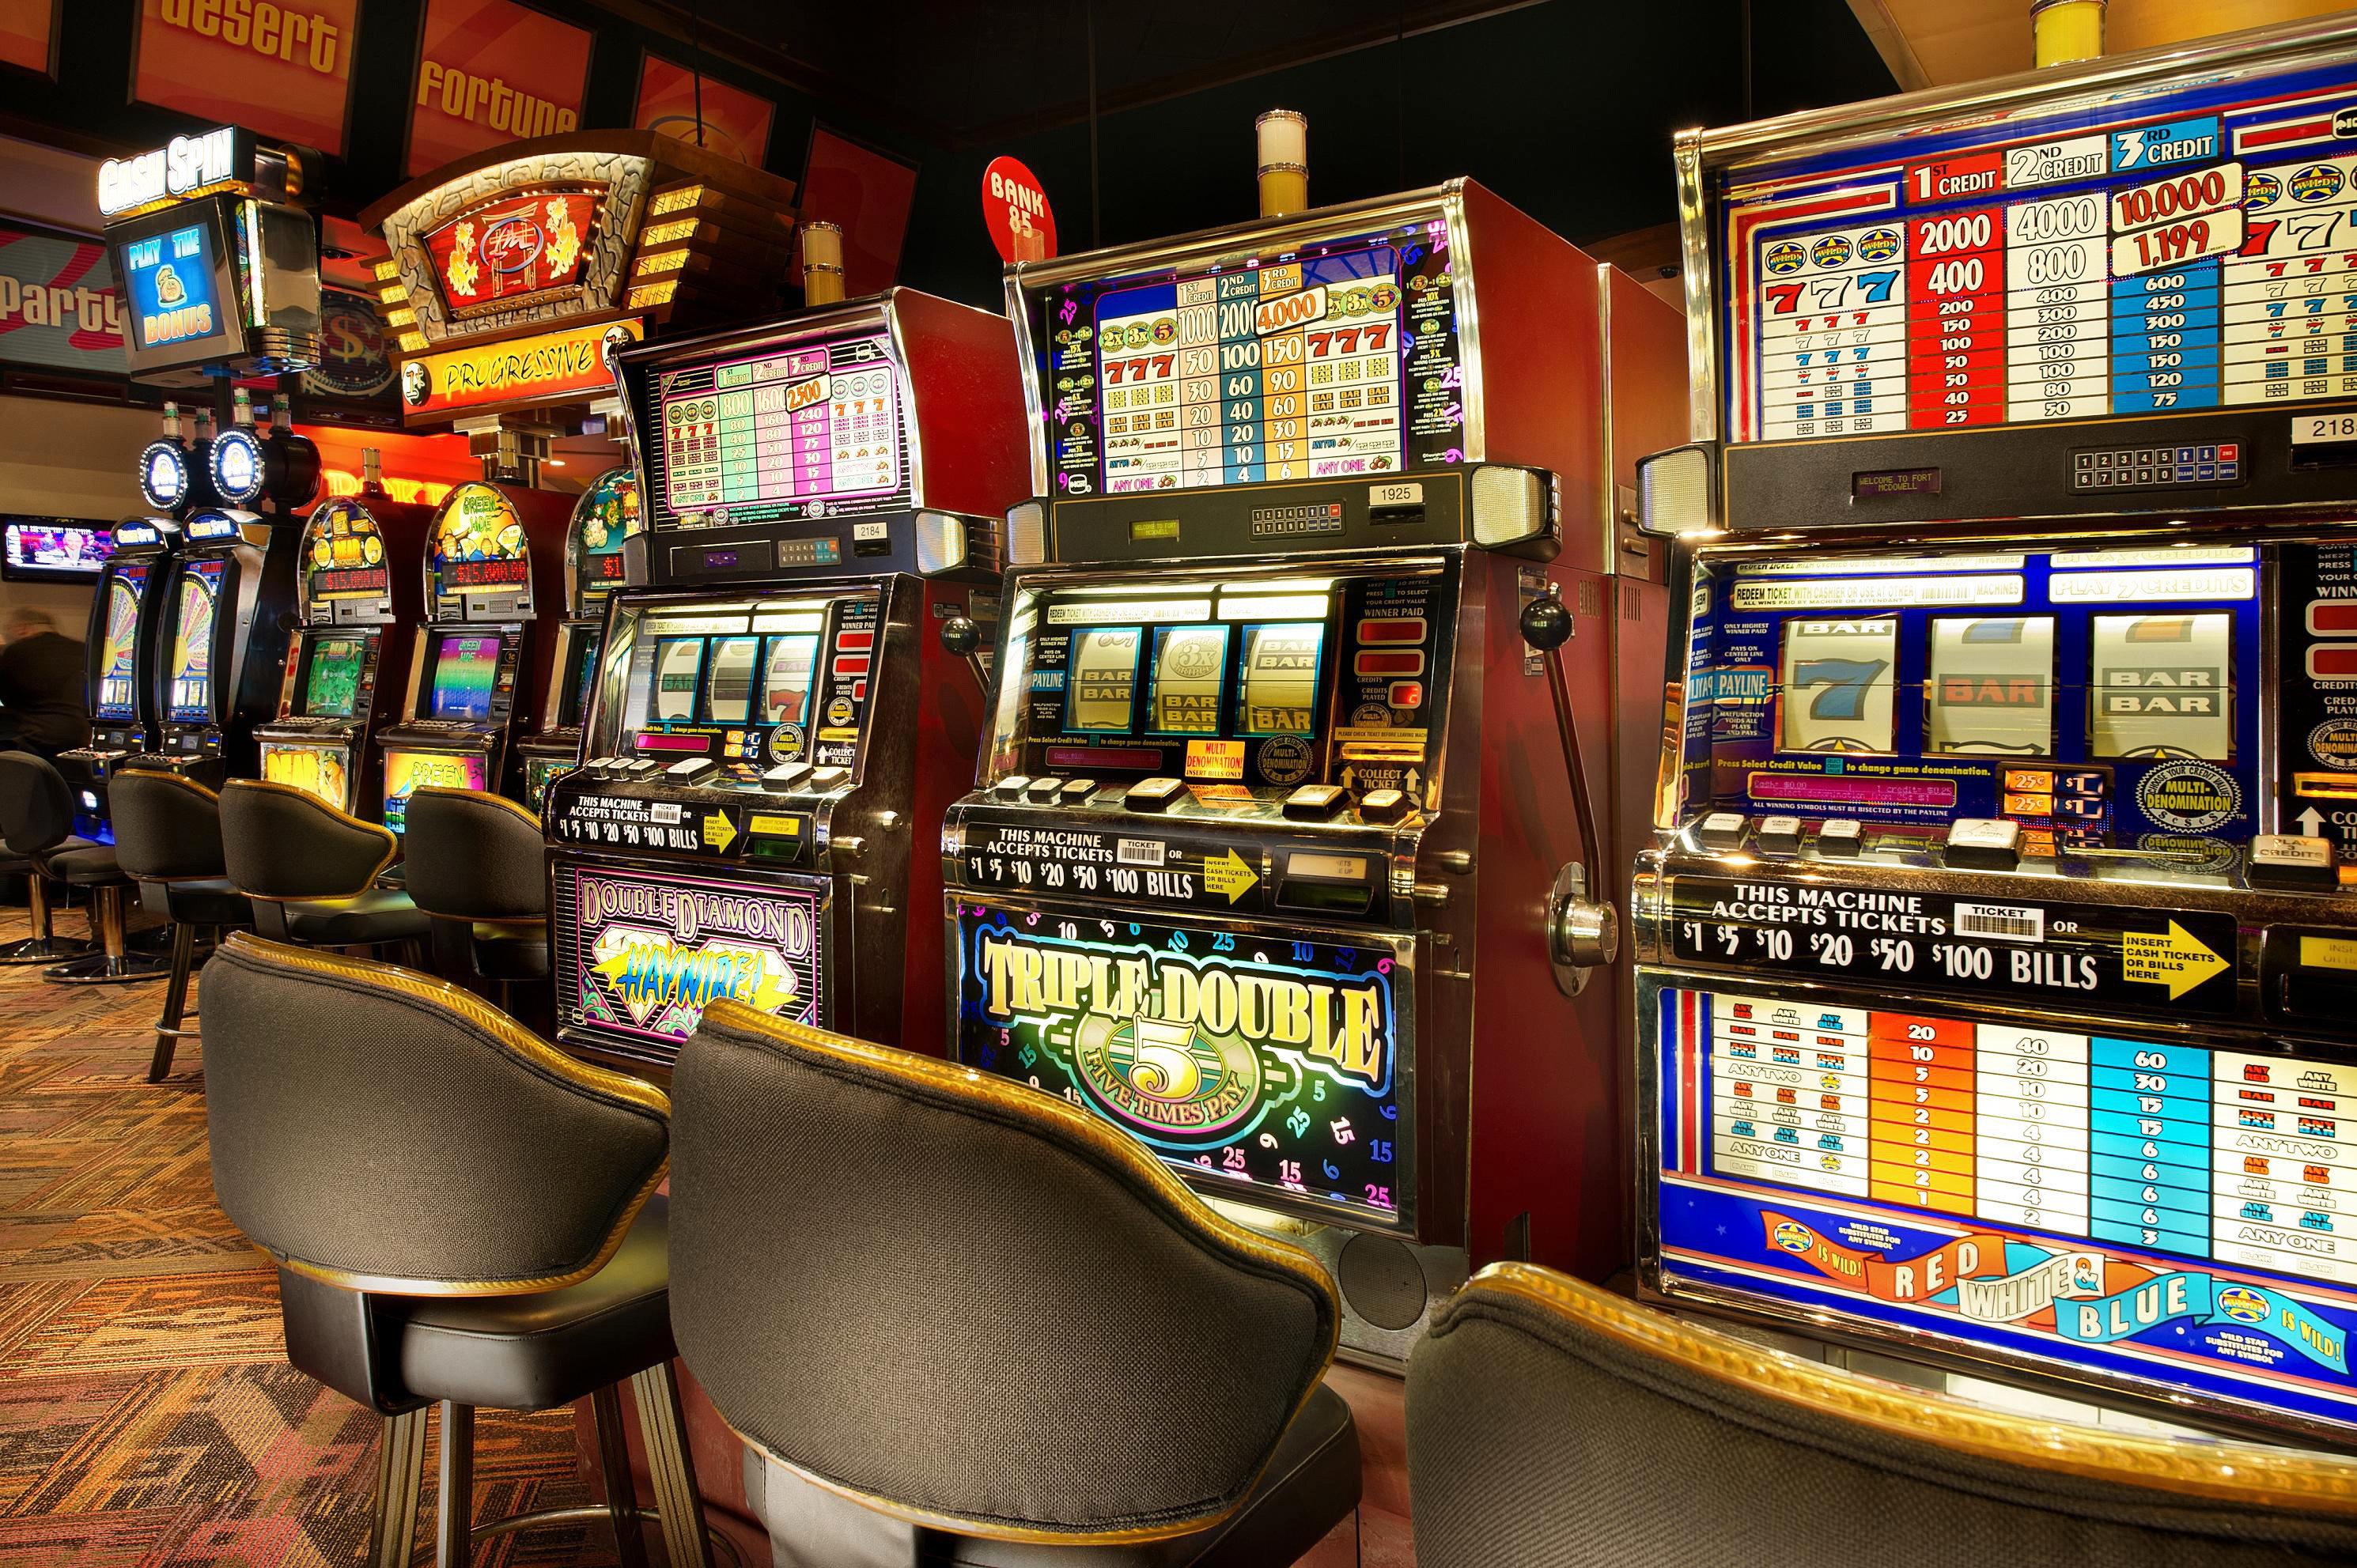 building machine slot machine Casino cluttered